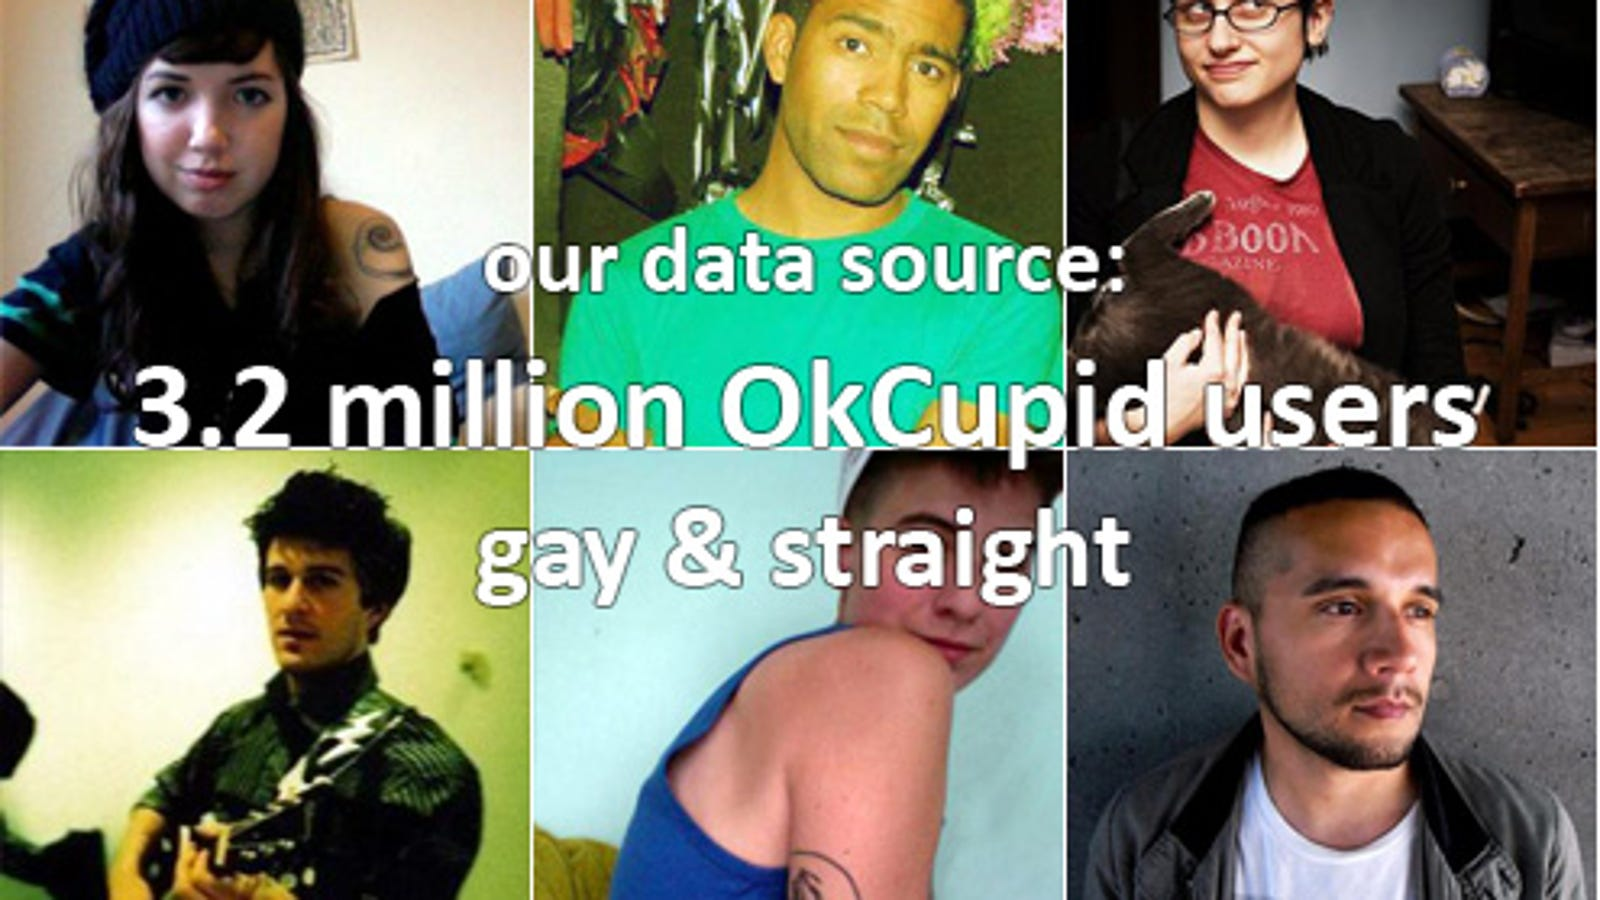 gay spanking boys